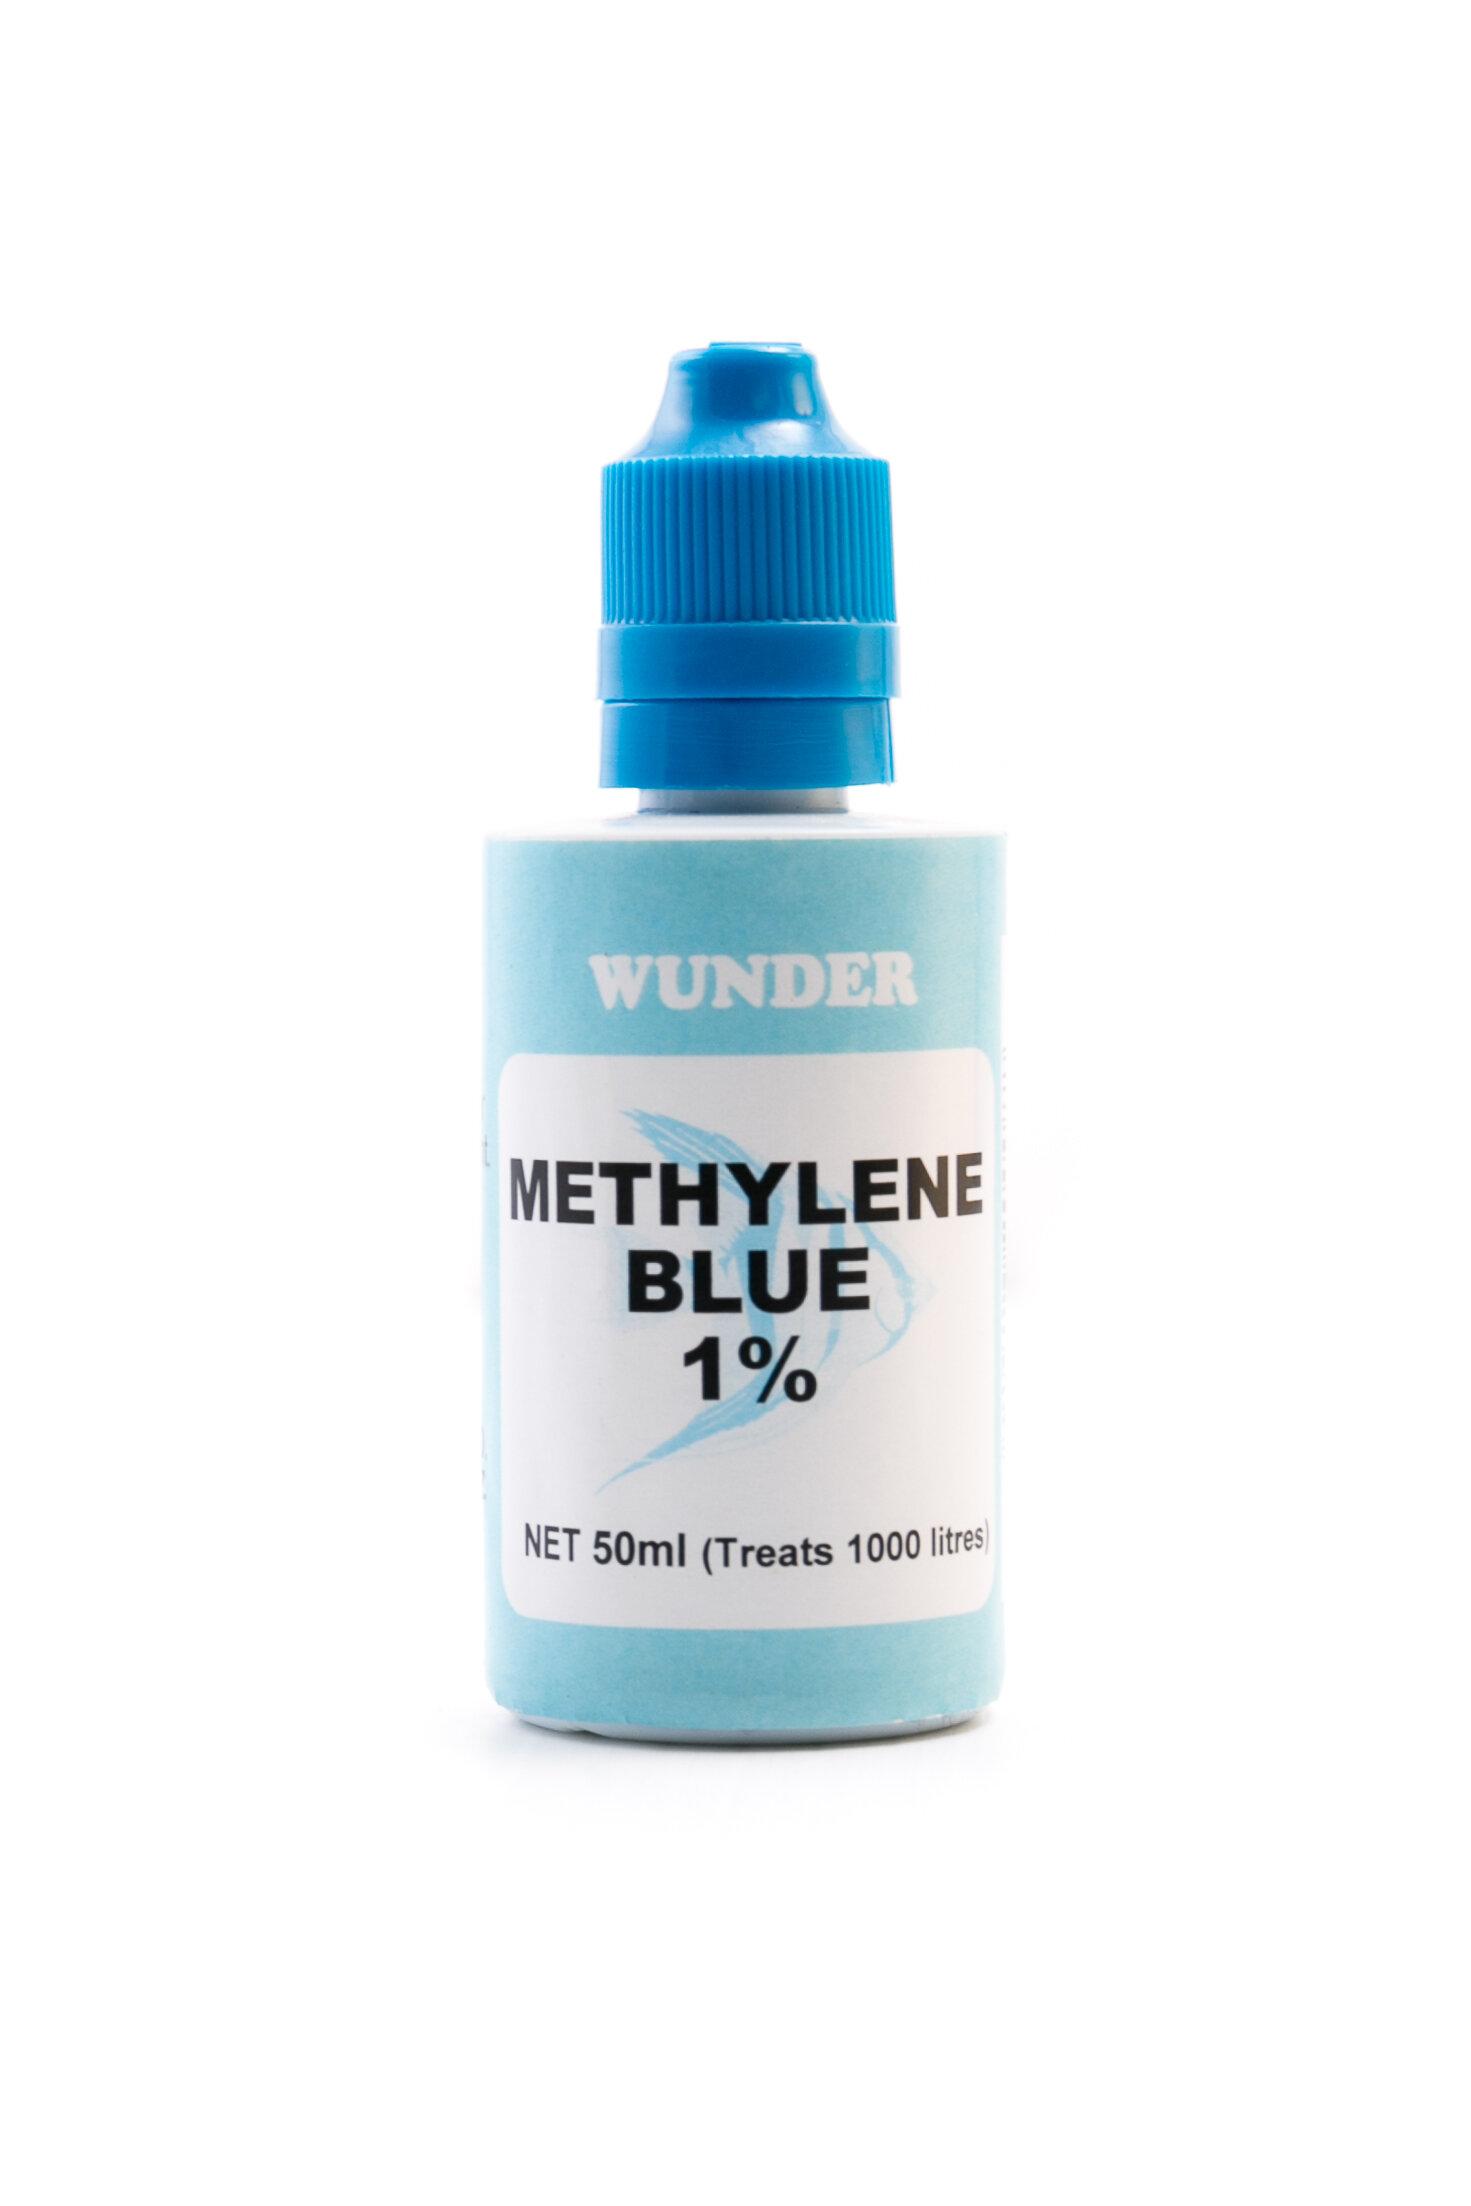 Methylene Blue - Fish-Health-Fish Health : Pet kiwi - Wunder